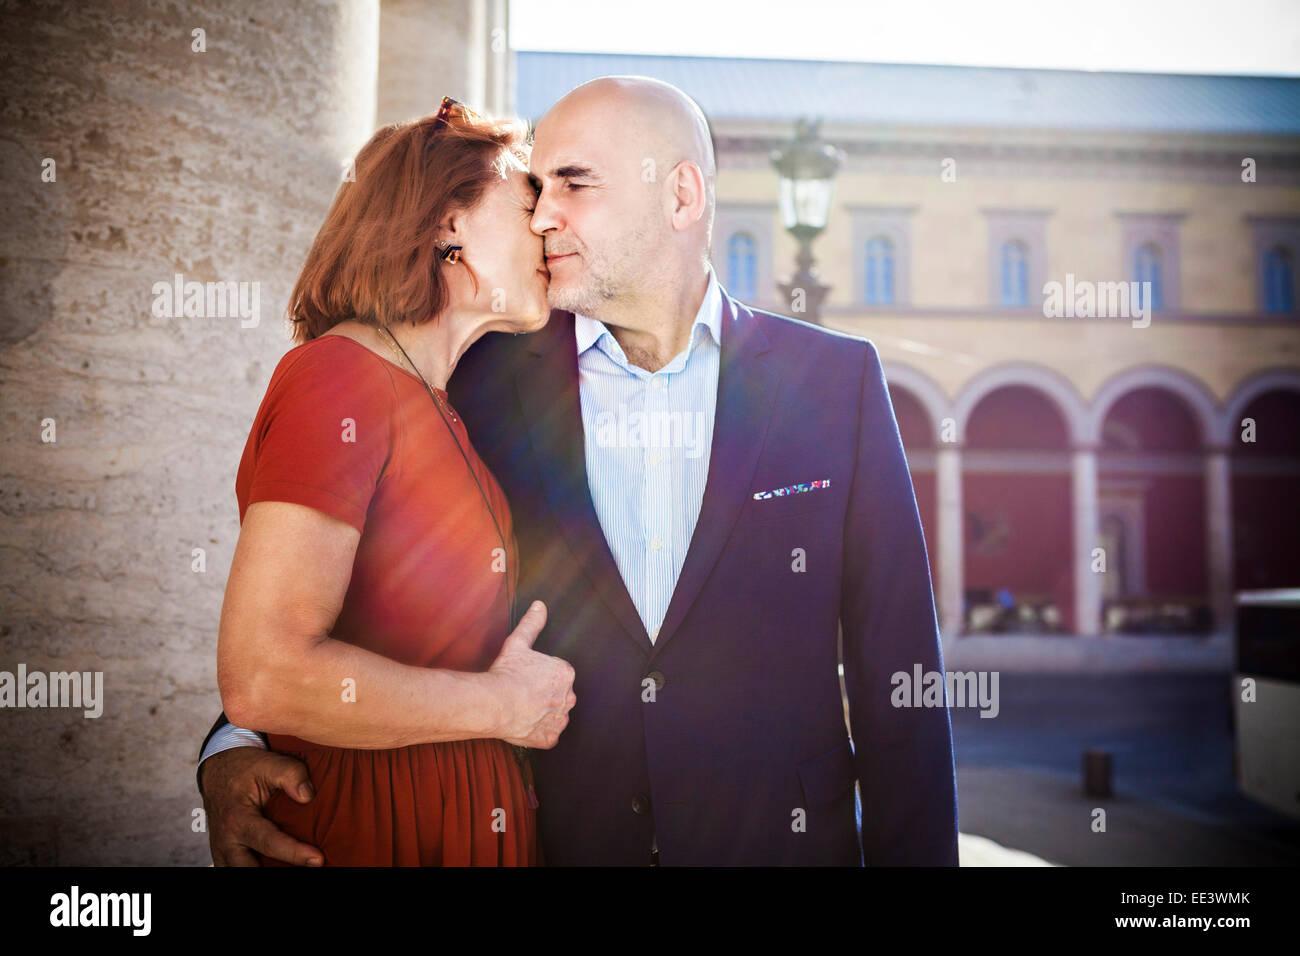 Senior couple kissing tenderly, Munich, Bavaria, Germany - Stock Image